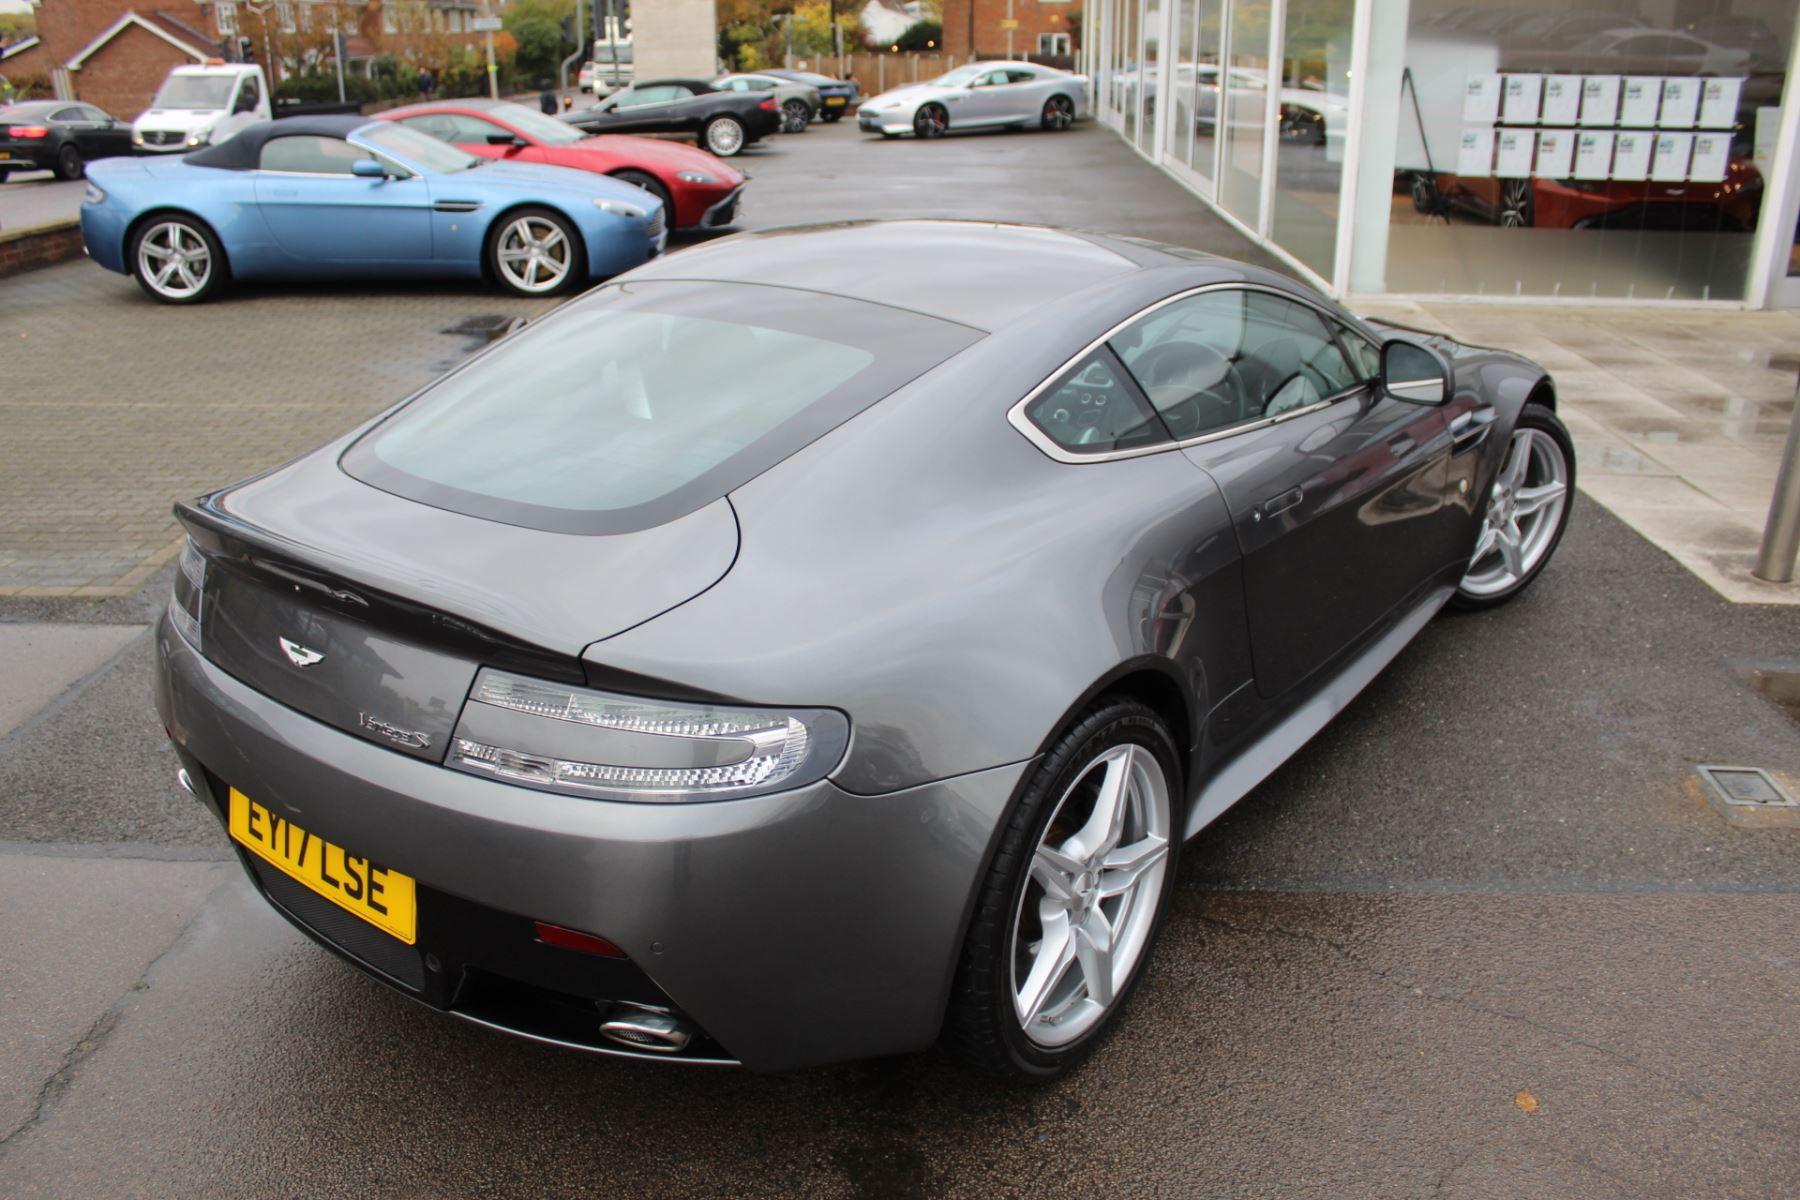 Aston Martin V8 Vantage S Coupe S 2dr Sportshift image 9